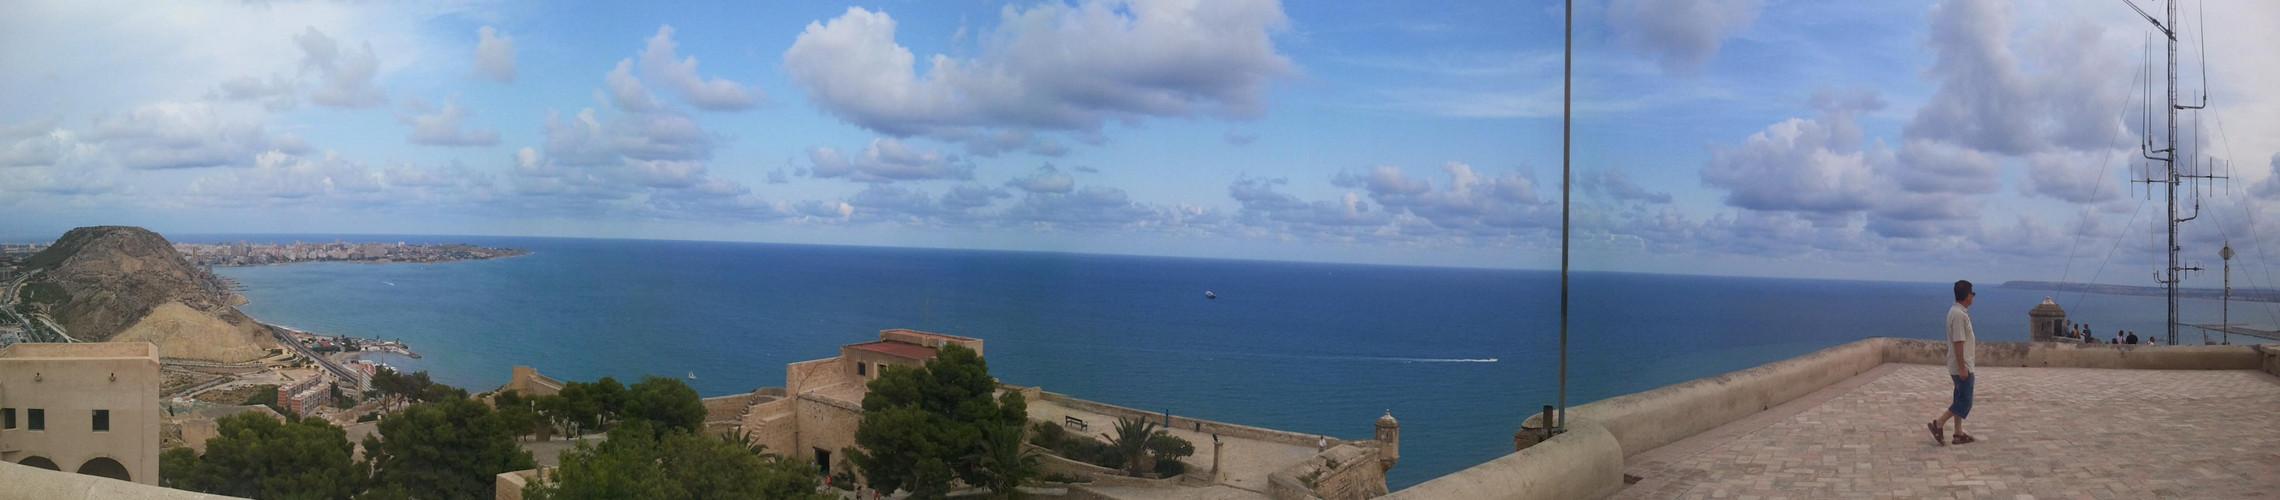 Panorama Alacant/ Alicante Part 1